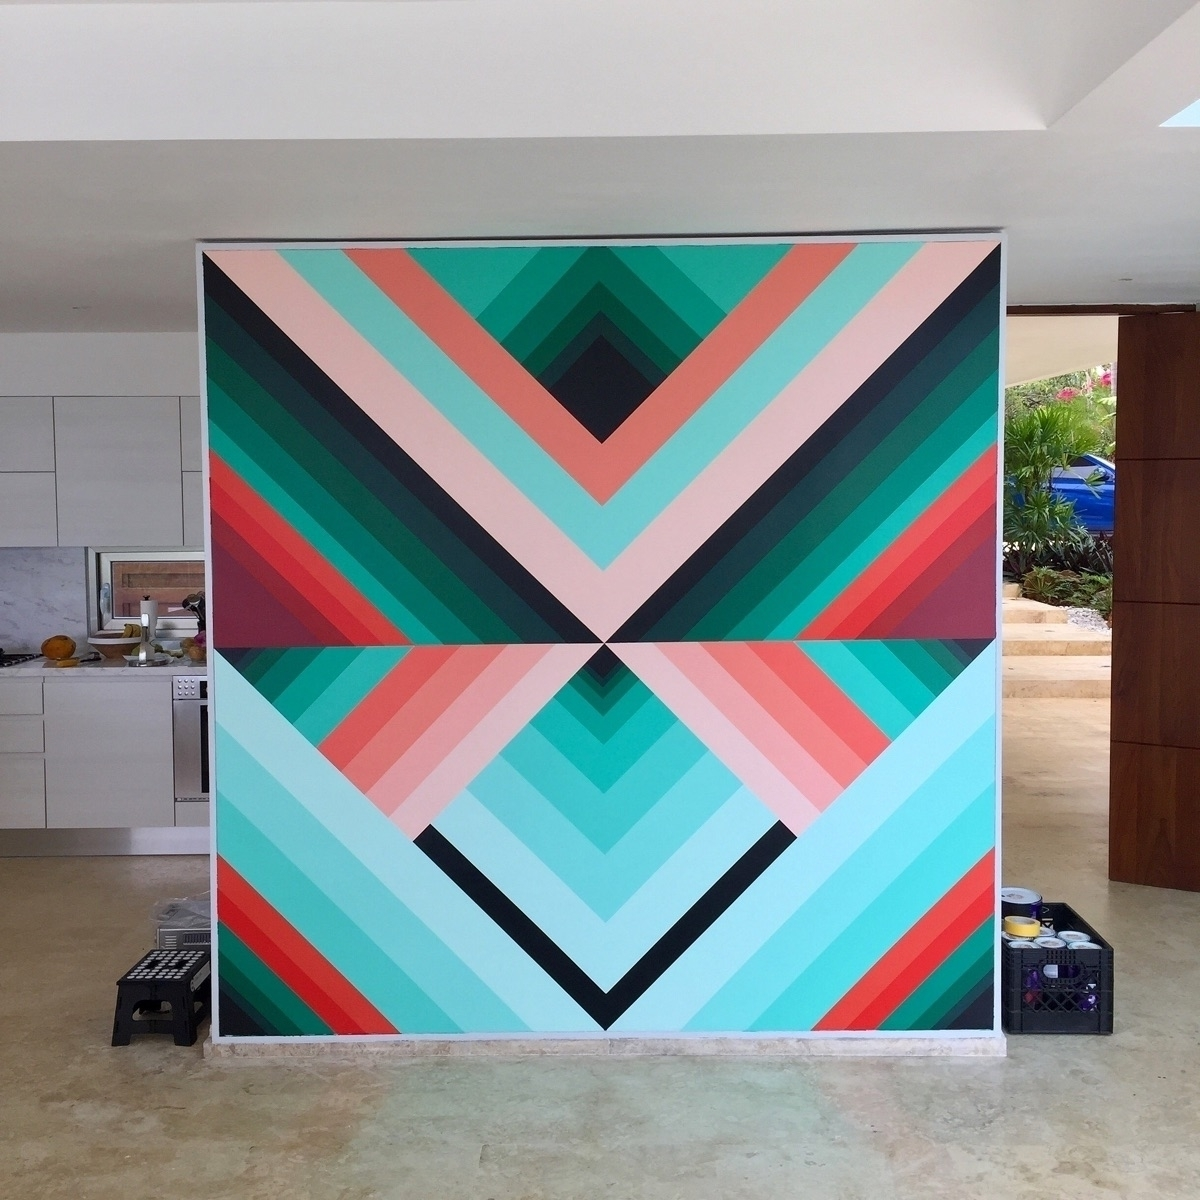 residential mural action - finished - dalek   ello